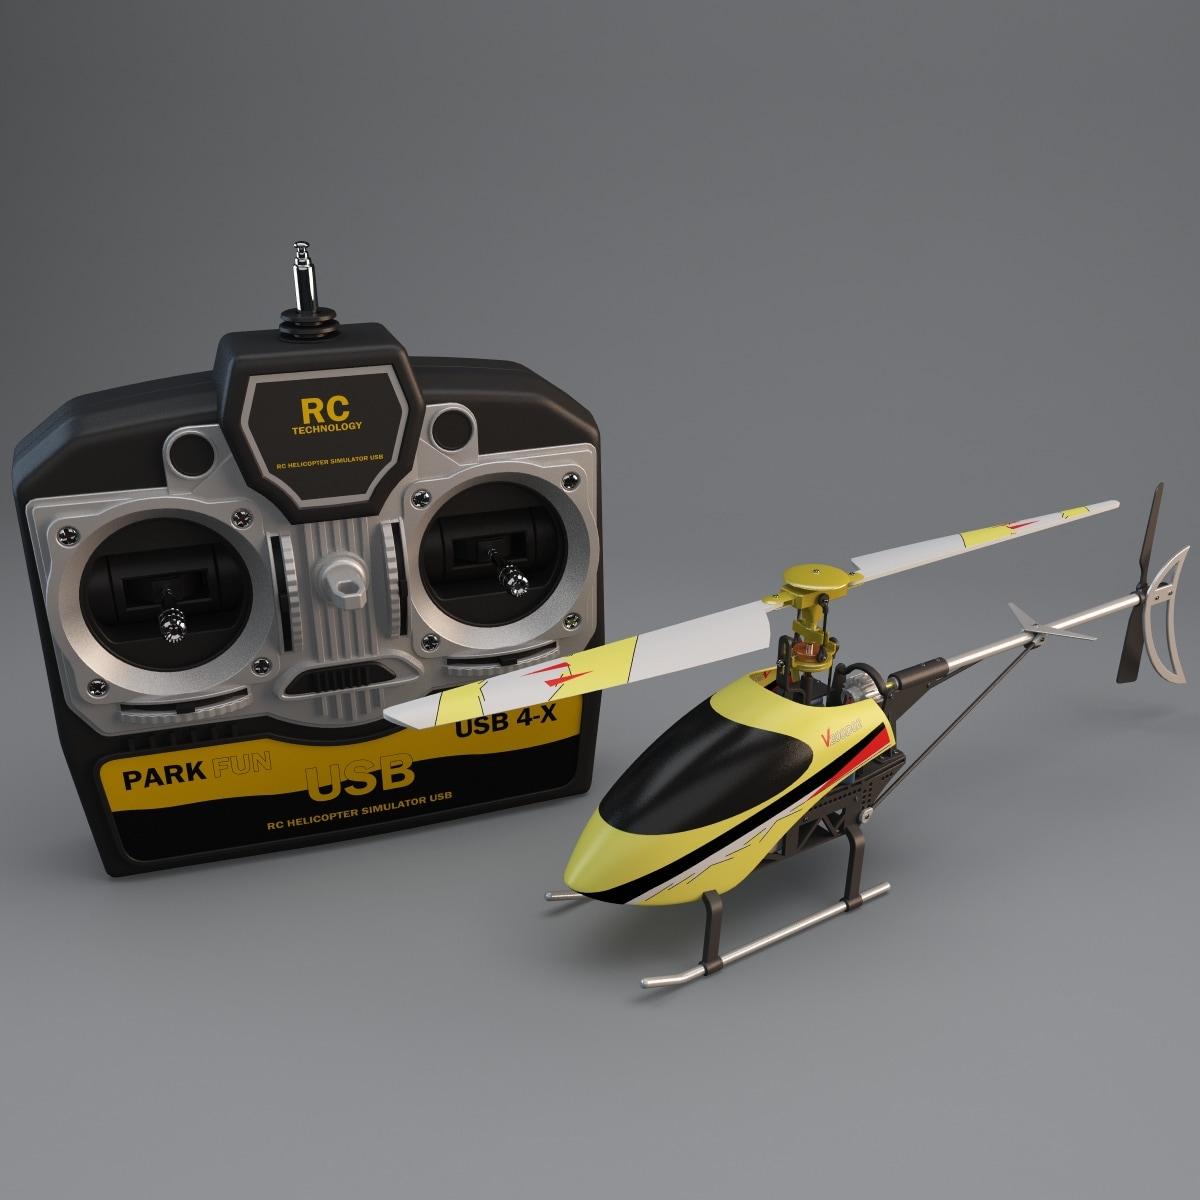 Mini_Helicopter_Walkera_Set_002.jpg